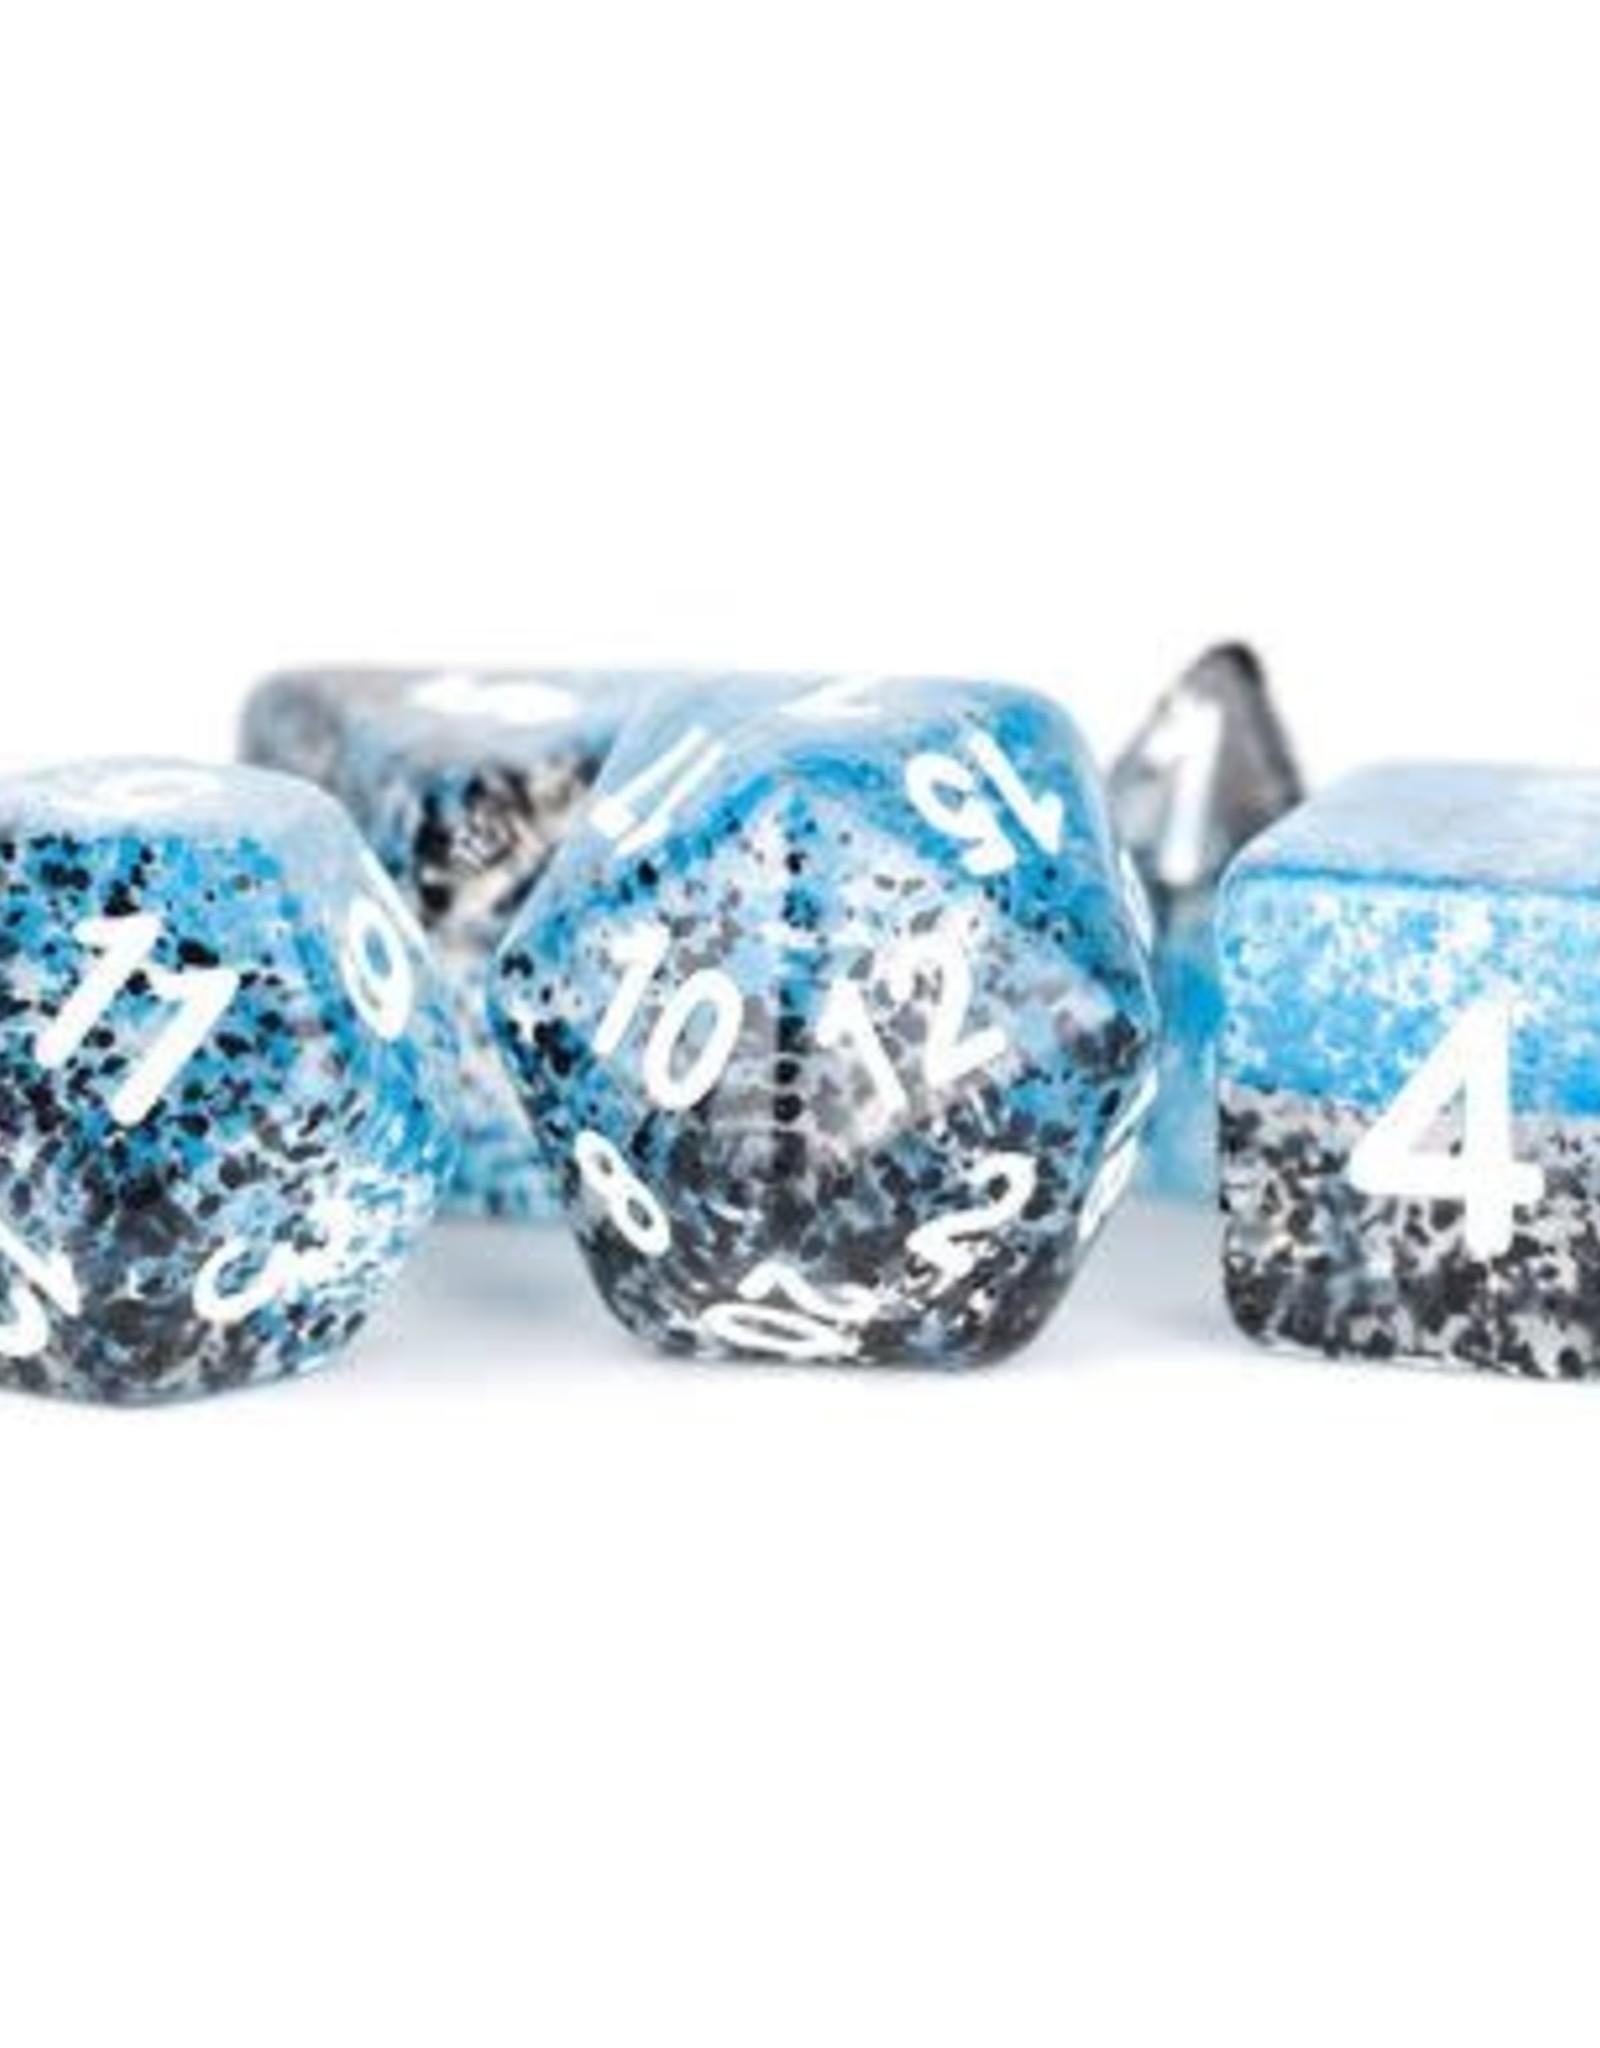 Metallic Dice Games Poly Set Dice Particle Blue/Black